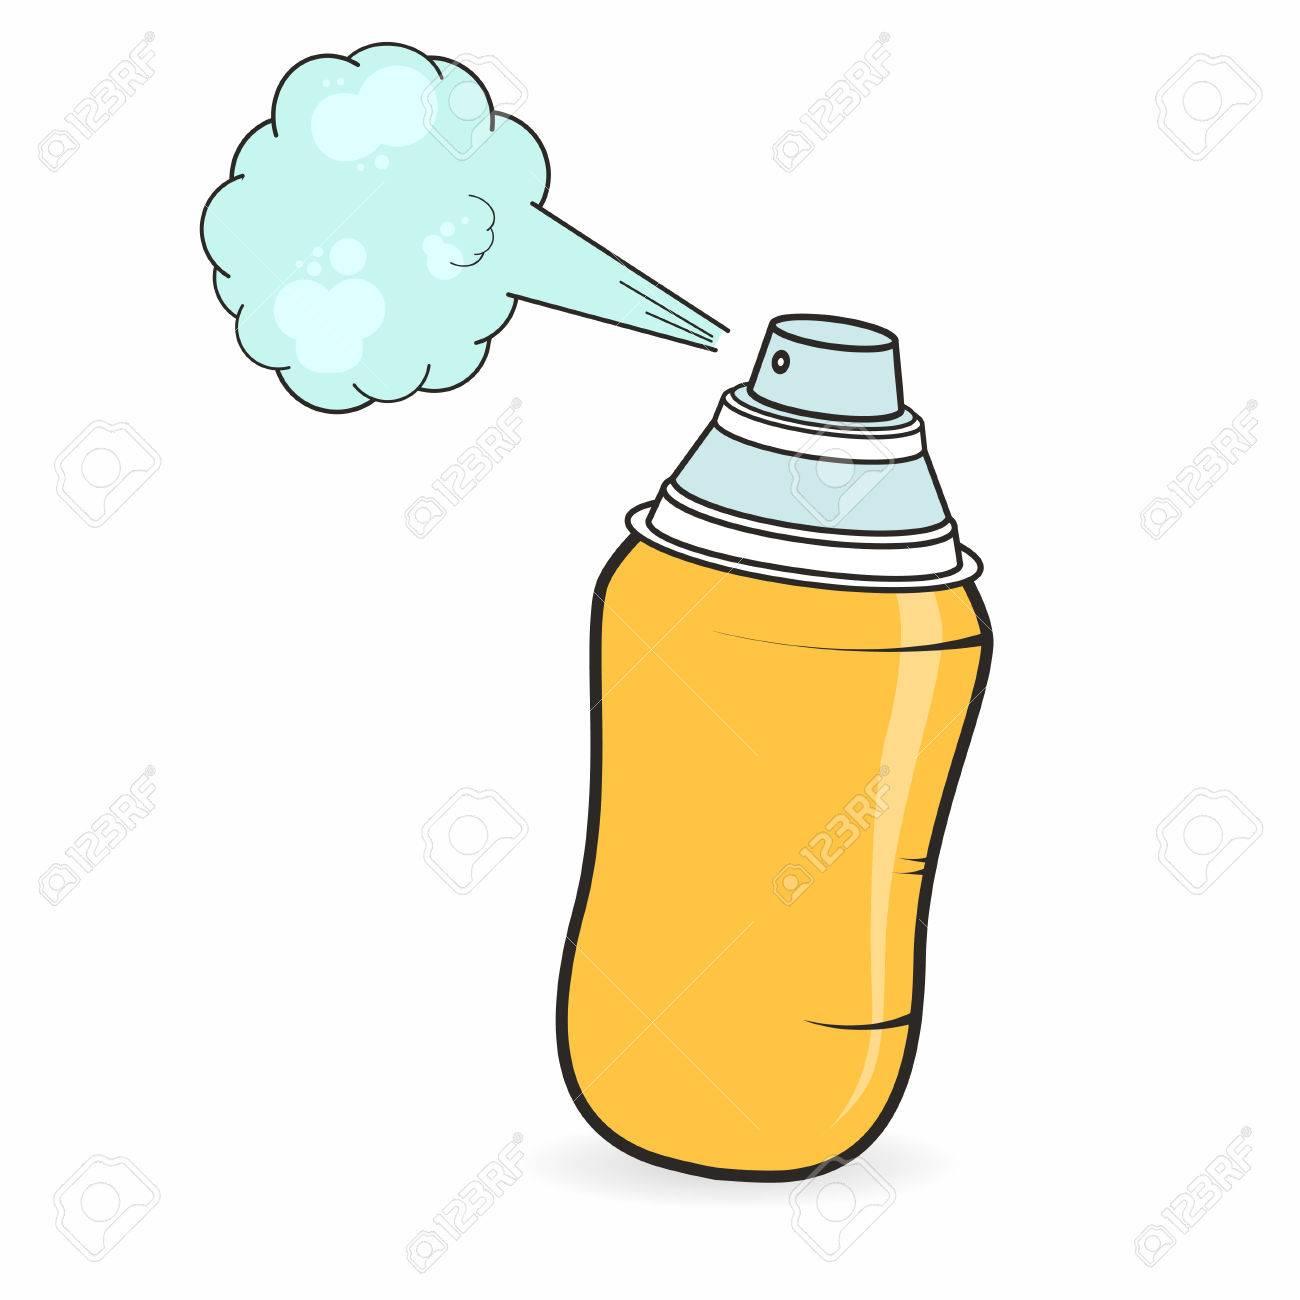 graffiti spray can in cartoon style isolated on white background rh 123rf com  graffiti spray free vector